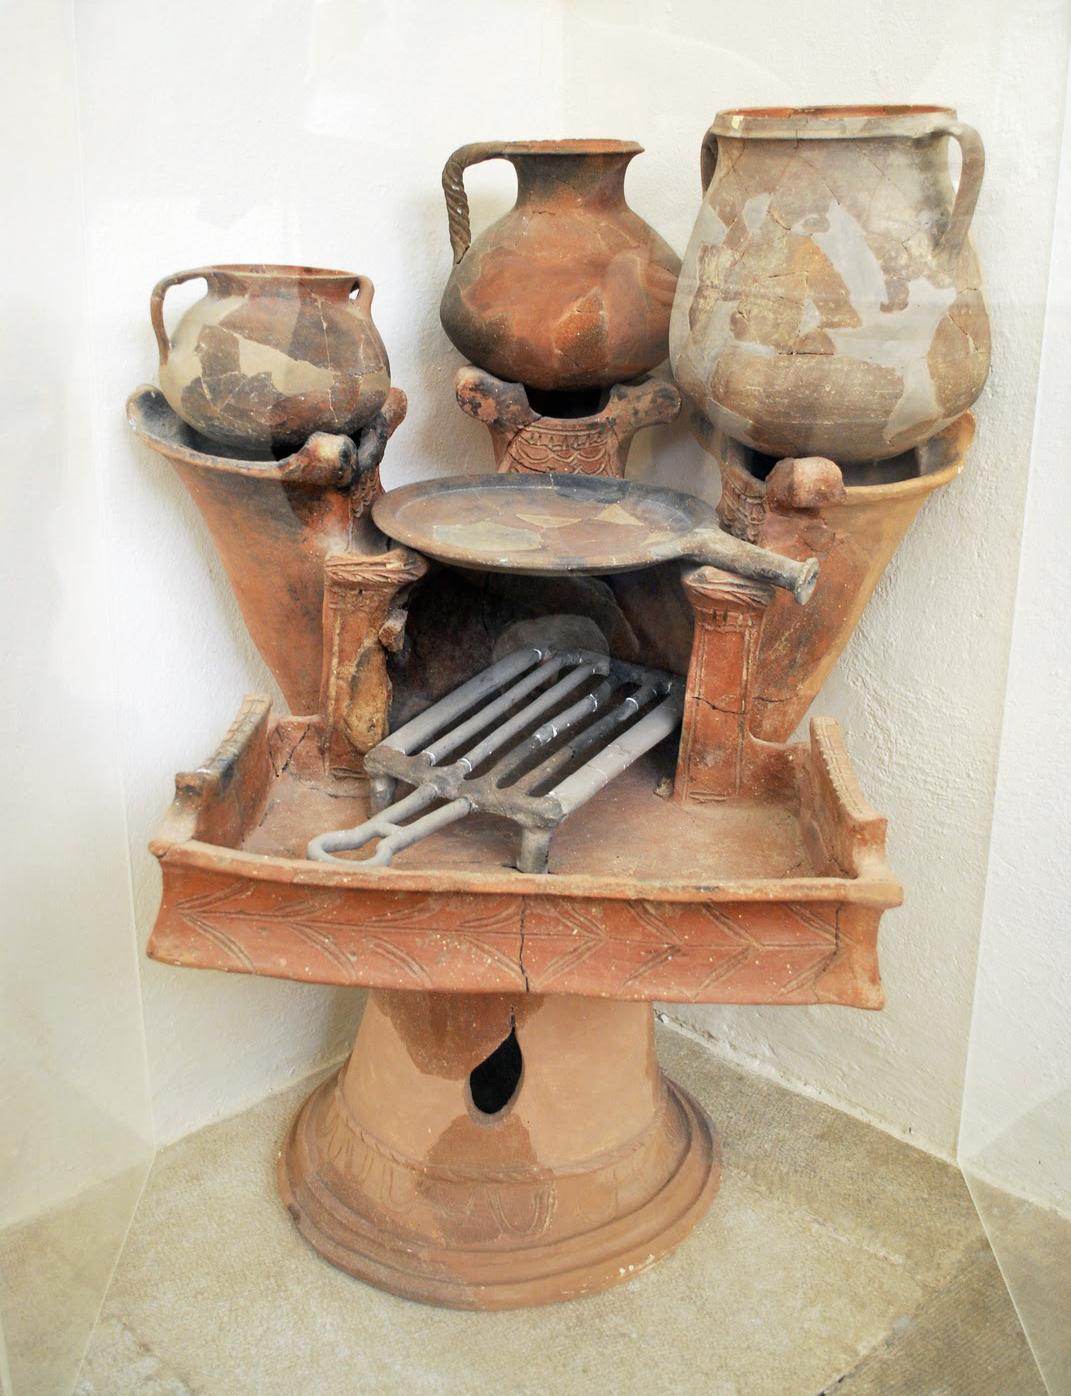 Clay Anthrakia Delos Greece Wewastetime